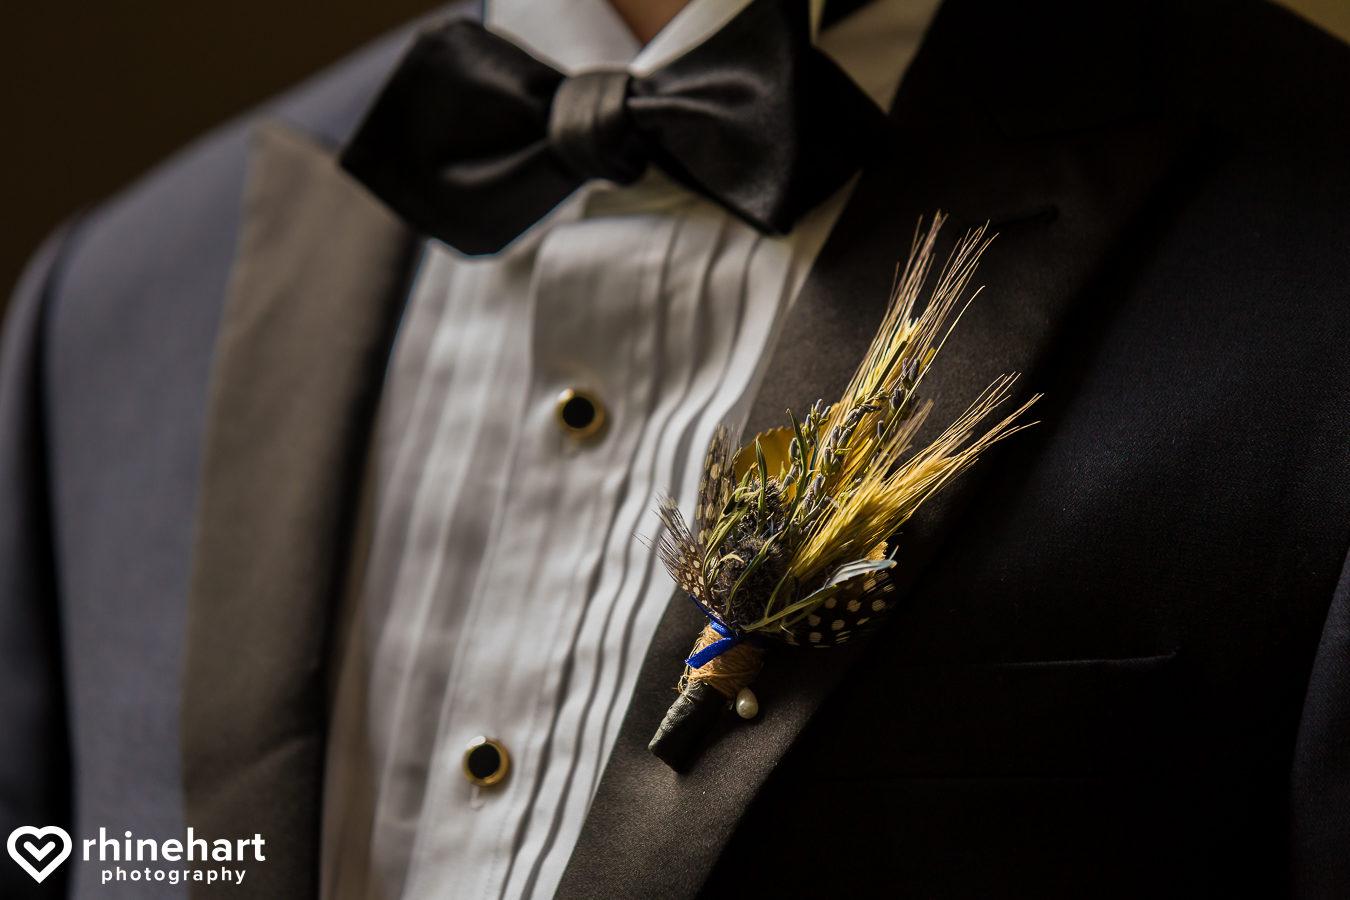 ledges-hotel-wedding-photographers-poconos-hawley-pa-best-creative-unique-artistic-fun-romantic-61